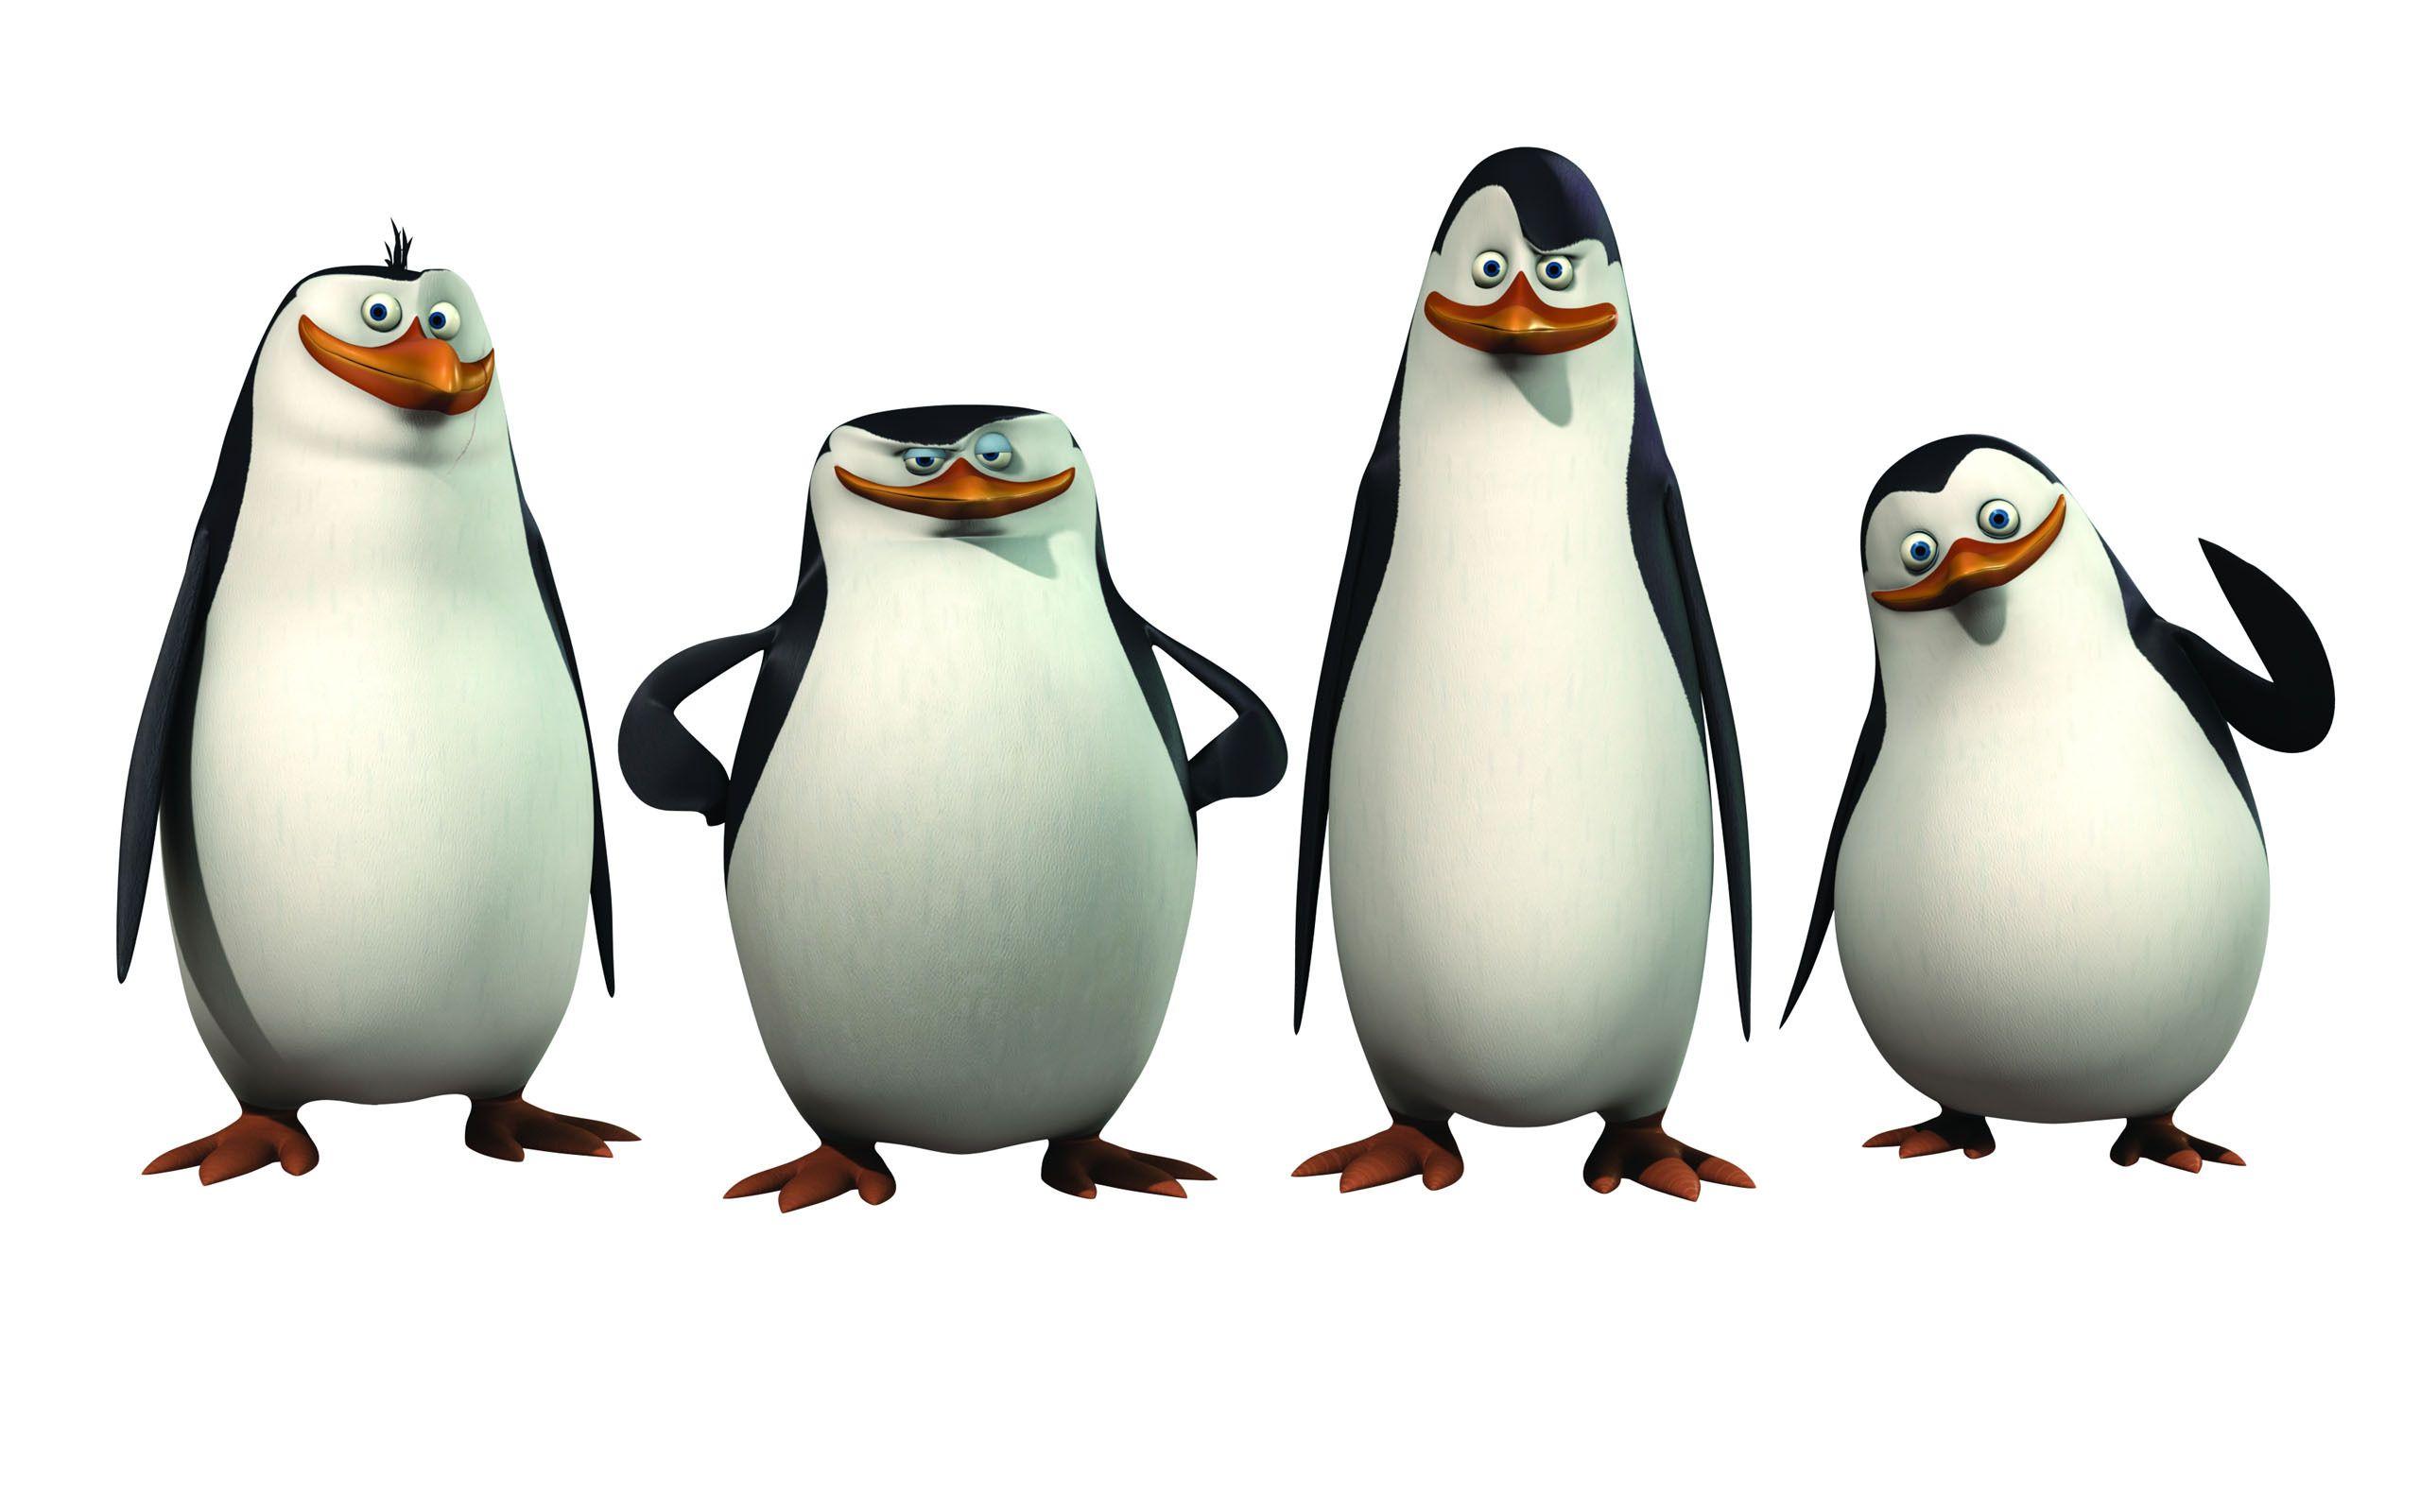 Madagascar 2 Cartoon Characters : Cartoon penguins images clipart best penquins